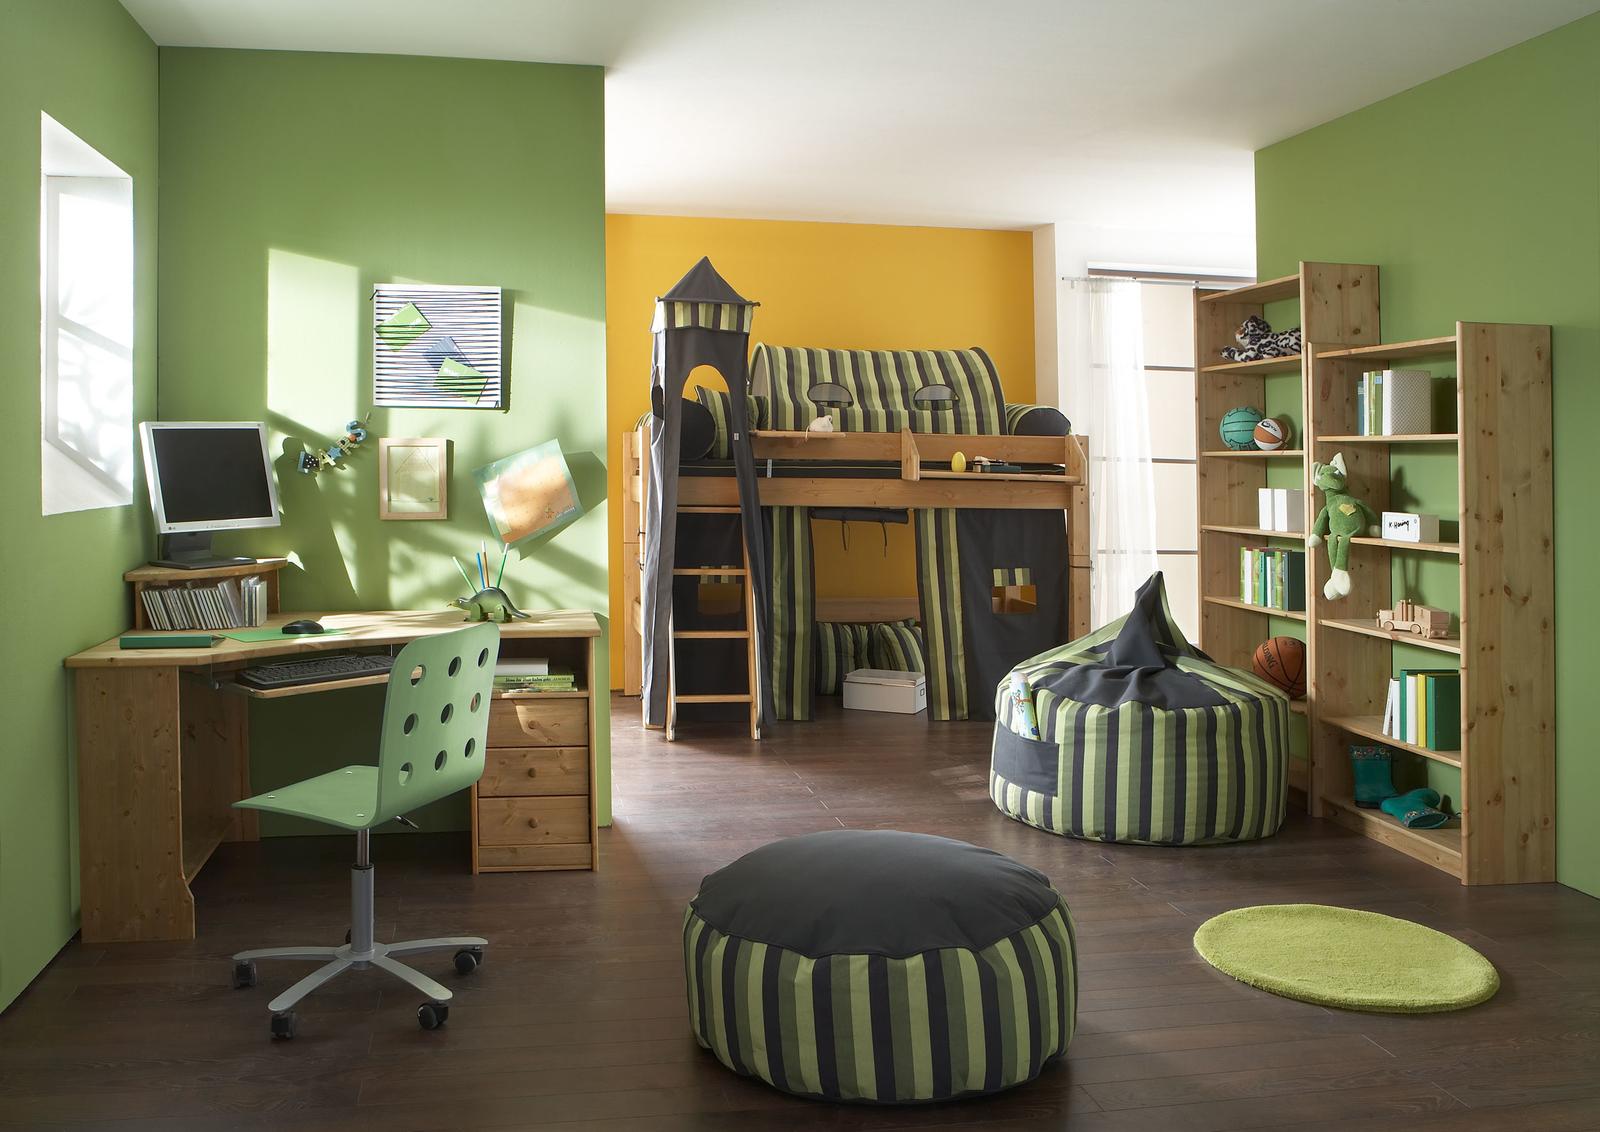 Full Size of Kinderzimmer Günstig Hochbett Forest Aus Massivholz Von Dolphin Gnstig Schlafzimmer Komplett Regal Bett 180x200 Chesterfield Sofa Günstiges Nach Maß Kaufen Kinderzimmer Kinderzimmer Günstig